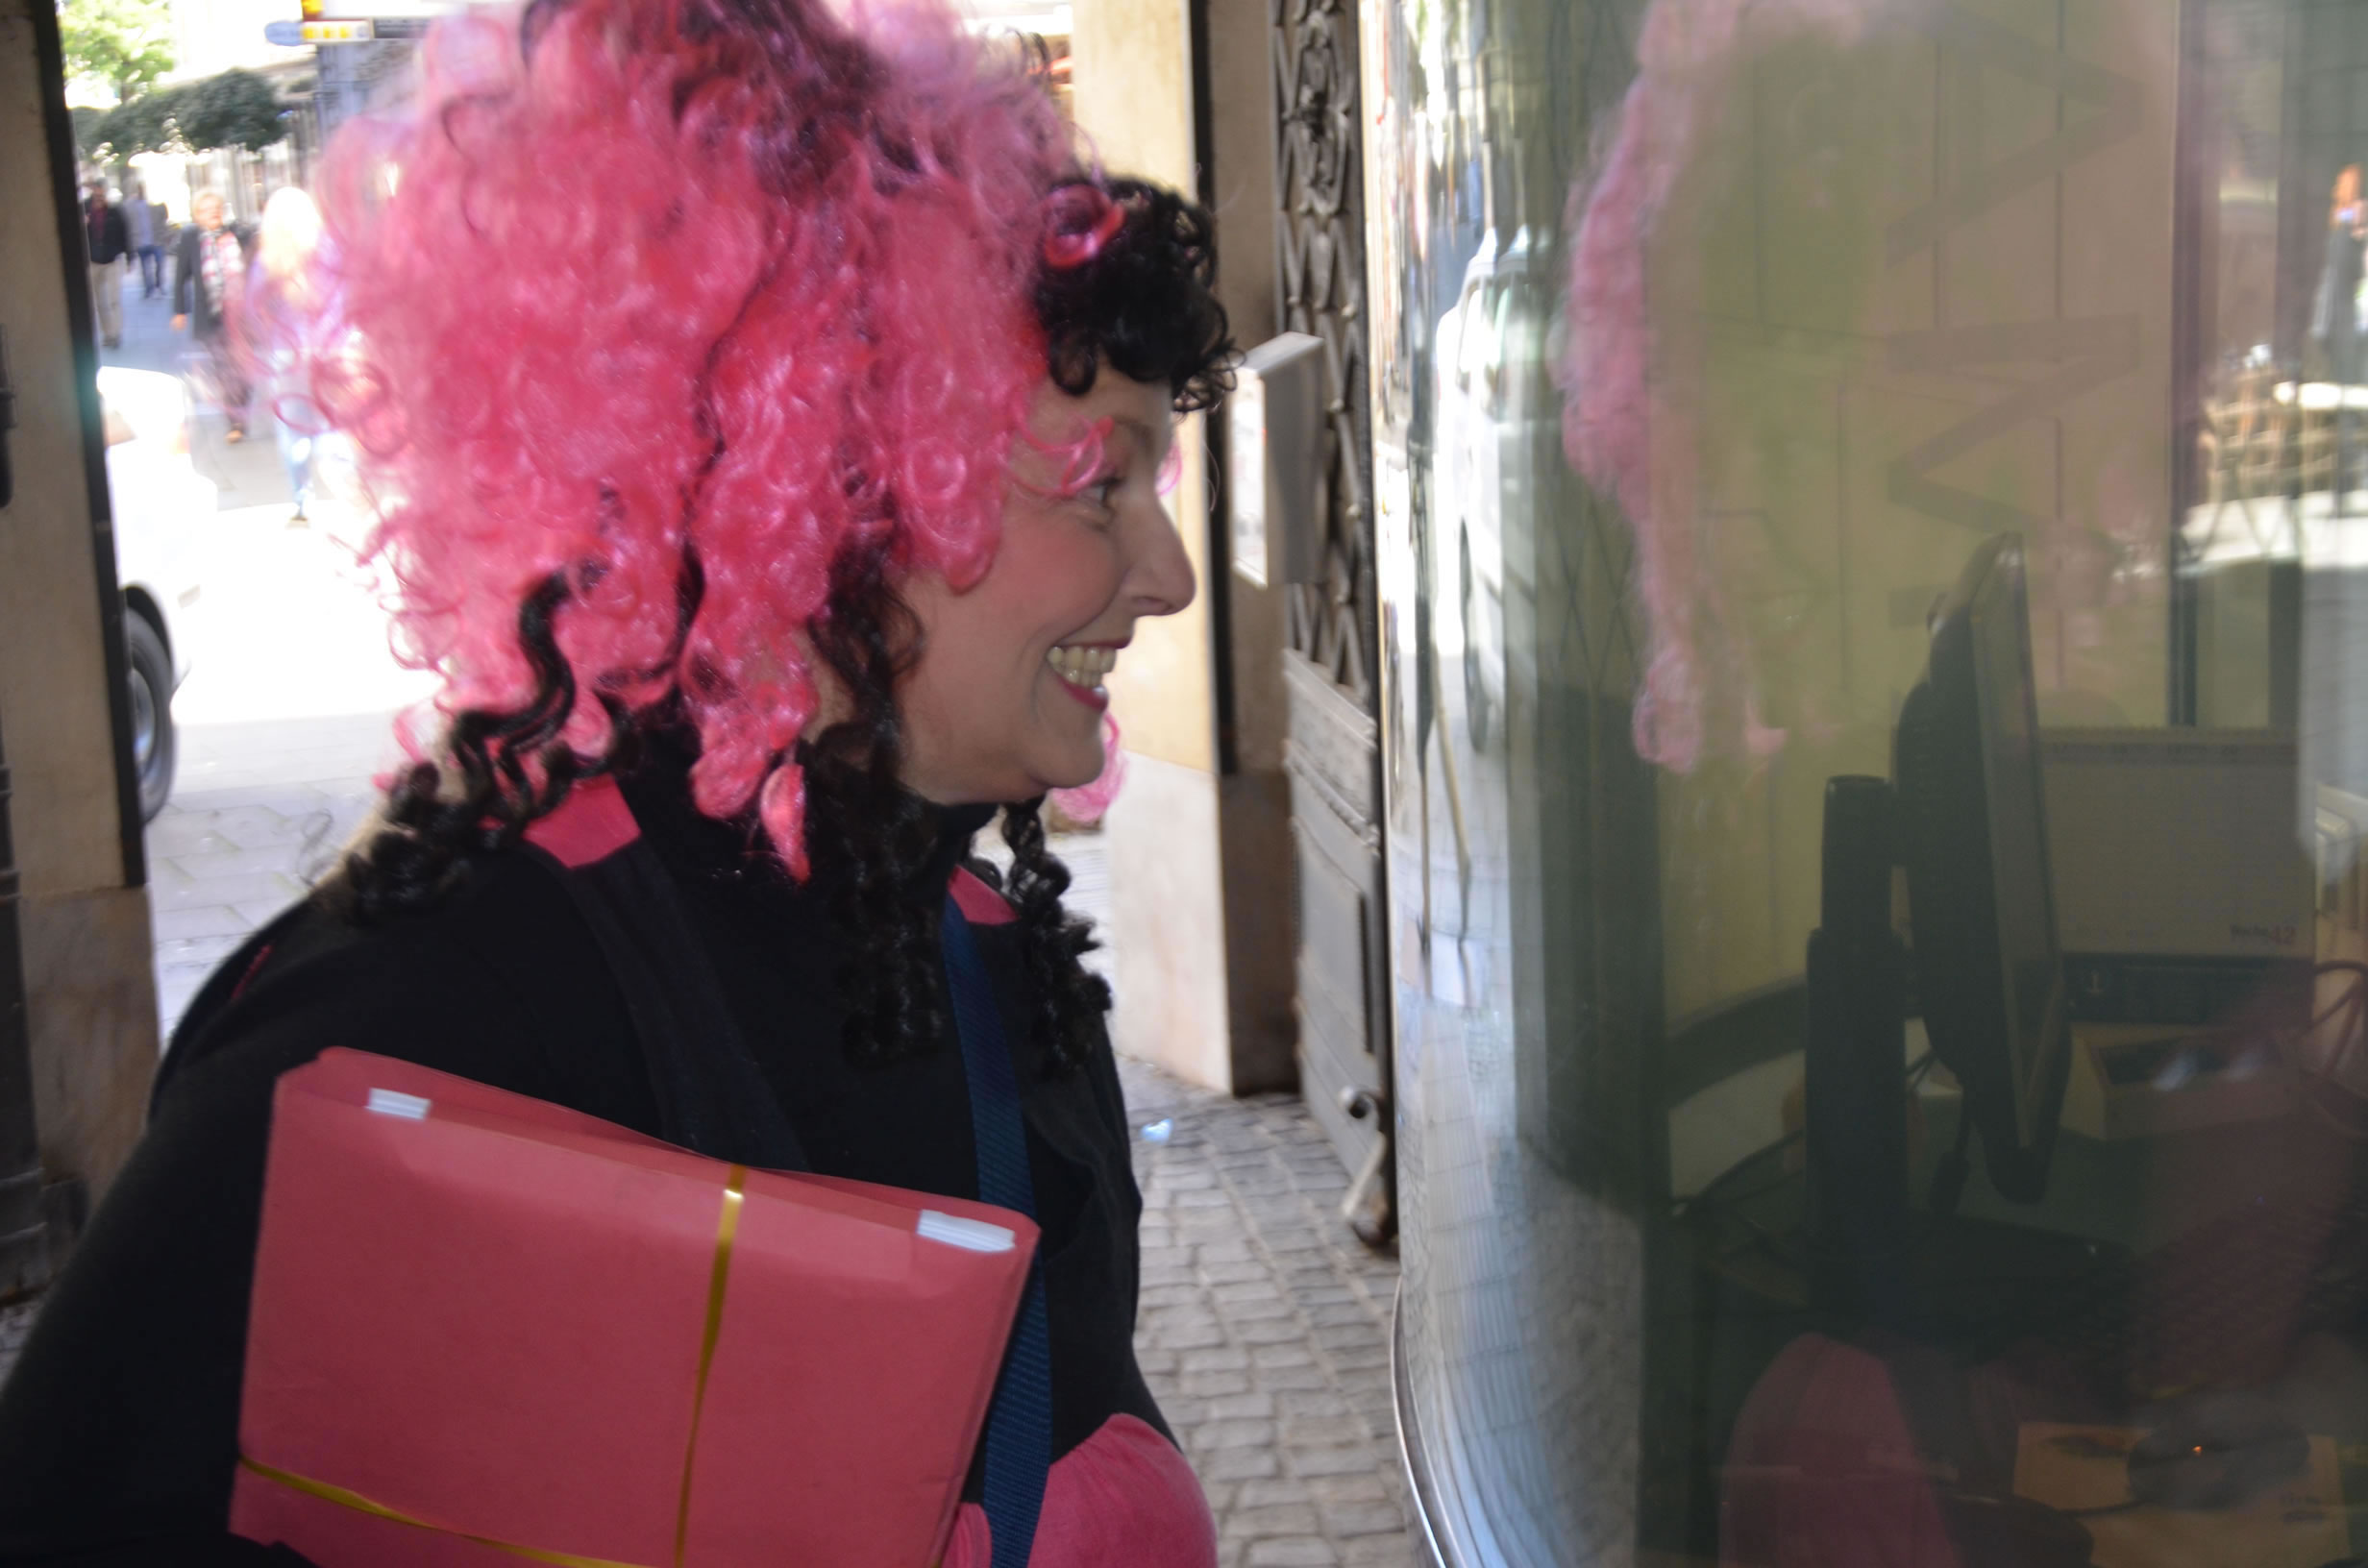 Betty Baloo Bande Wahleinreichung: Betty Baloo tritt im Grazer Rathaus ein